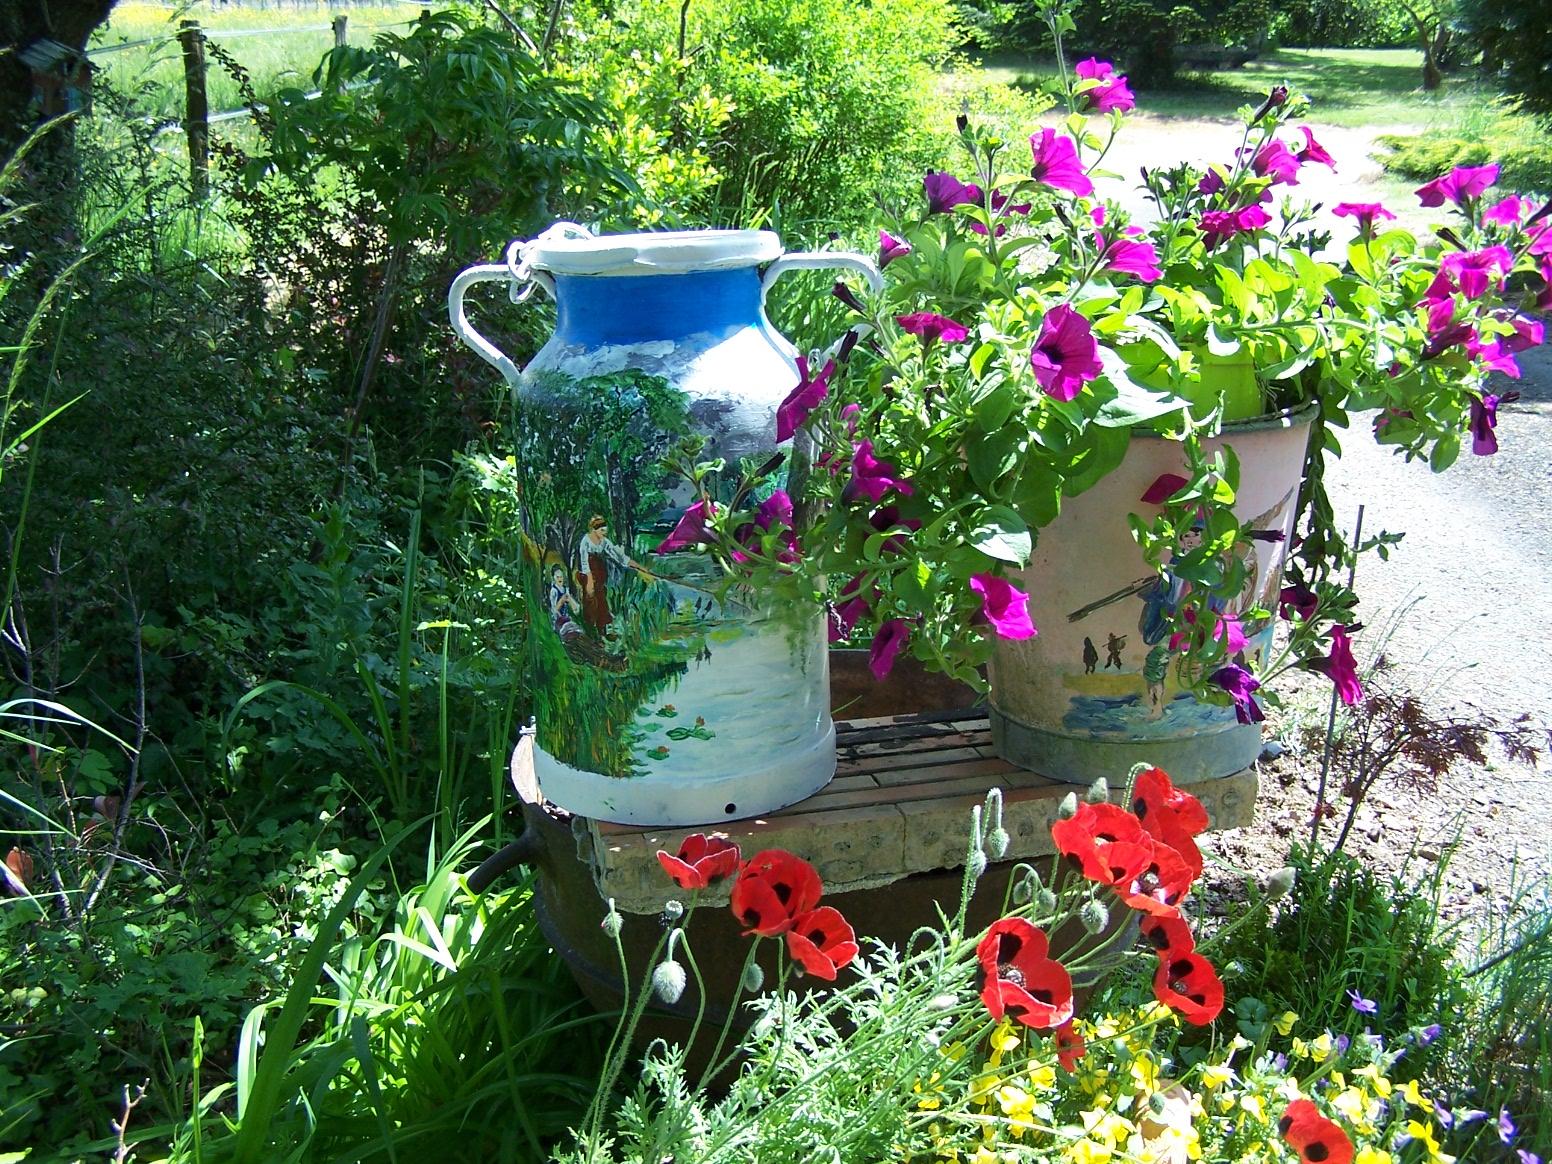 Bienvenue dans mon jardin a fill sur sarthe 2014 for Jardin google translate